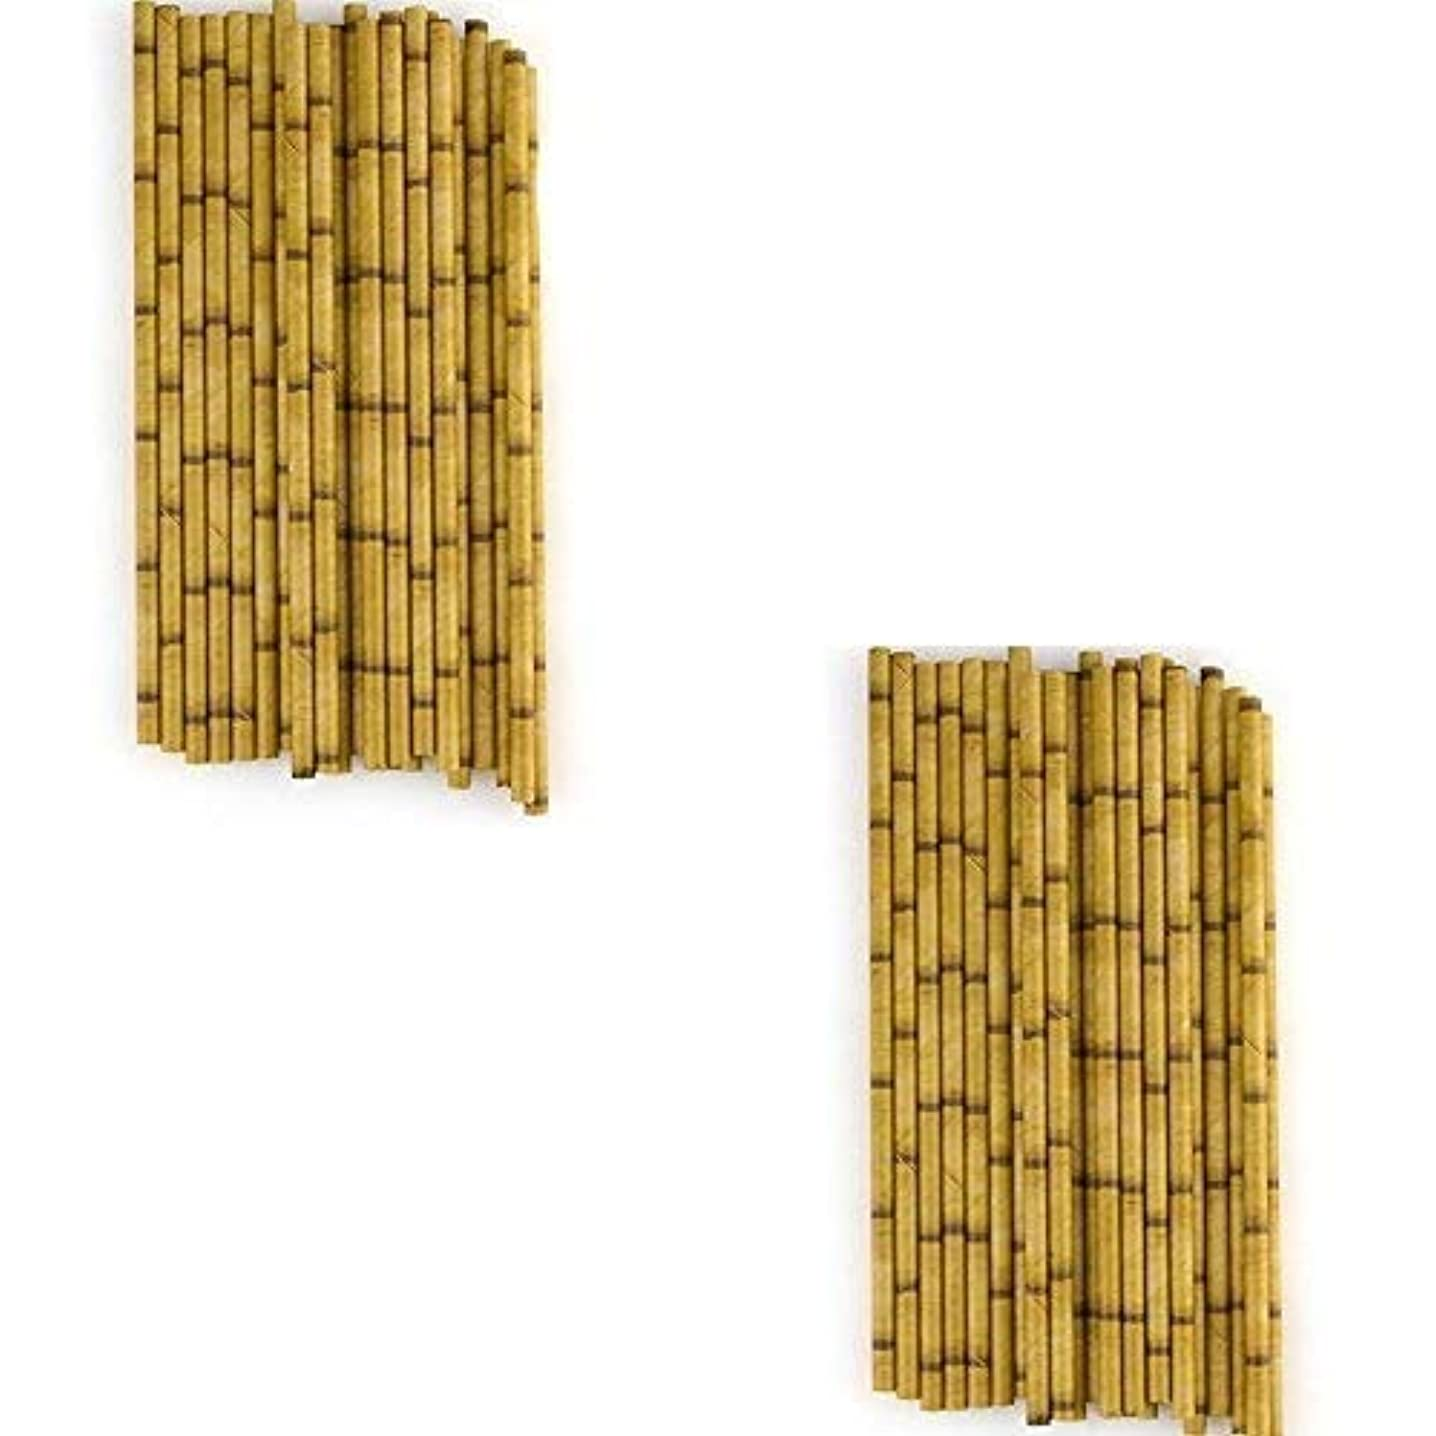 Bamboo Paper Straws (48 Pack) 7 3/4